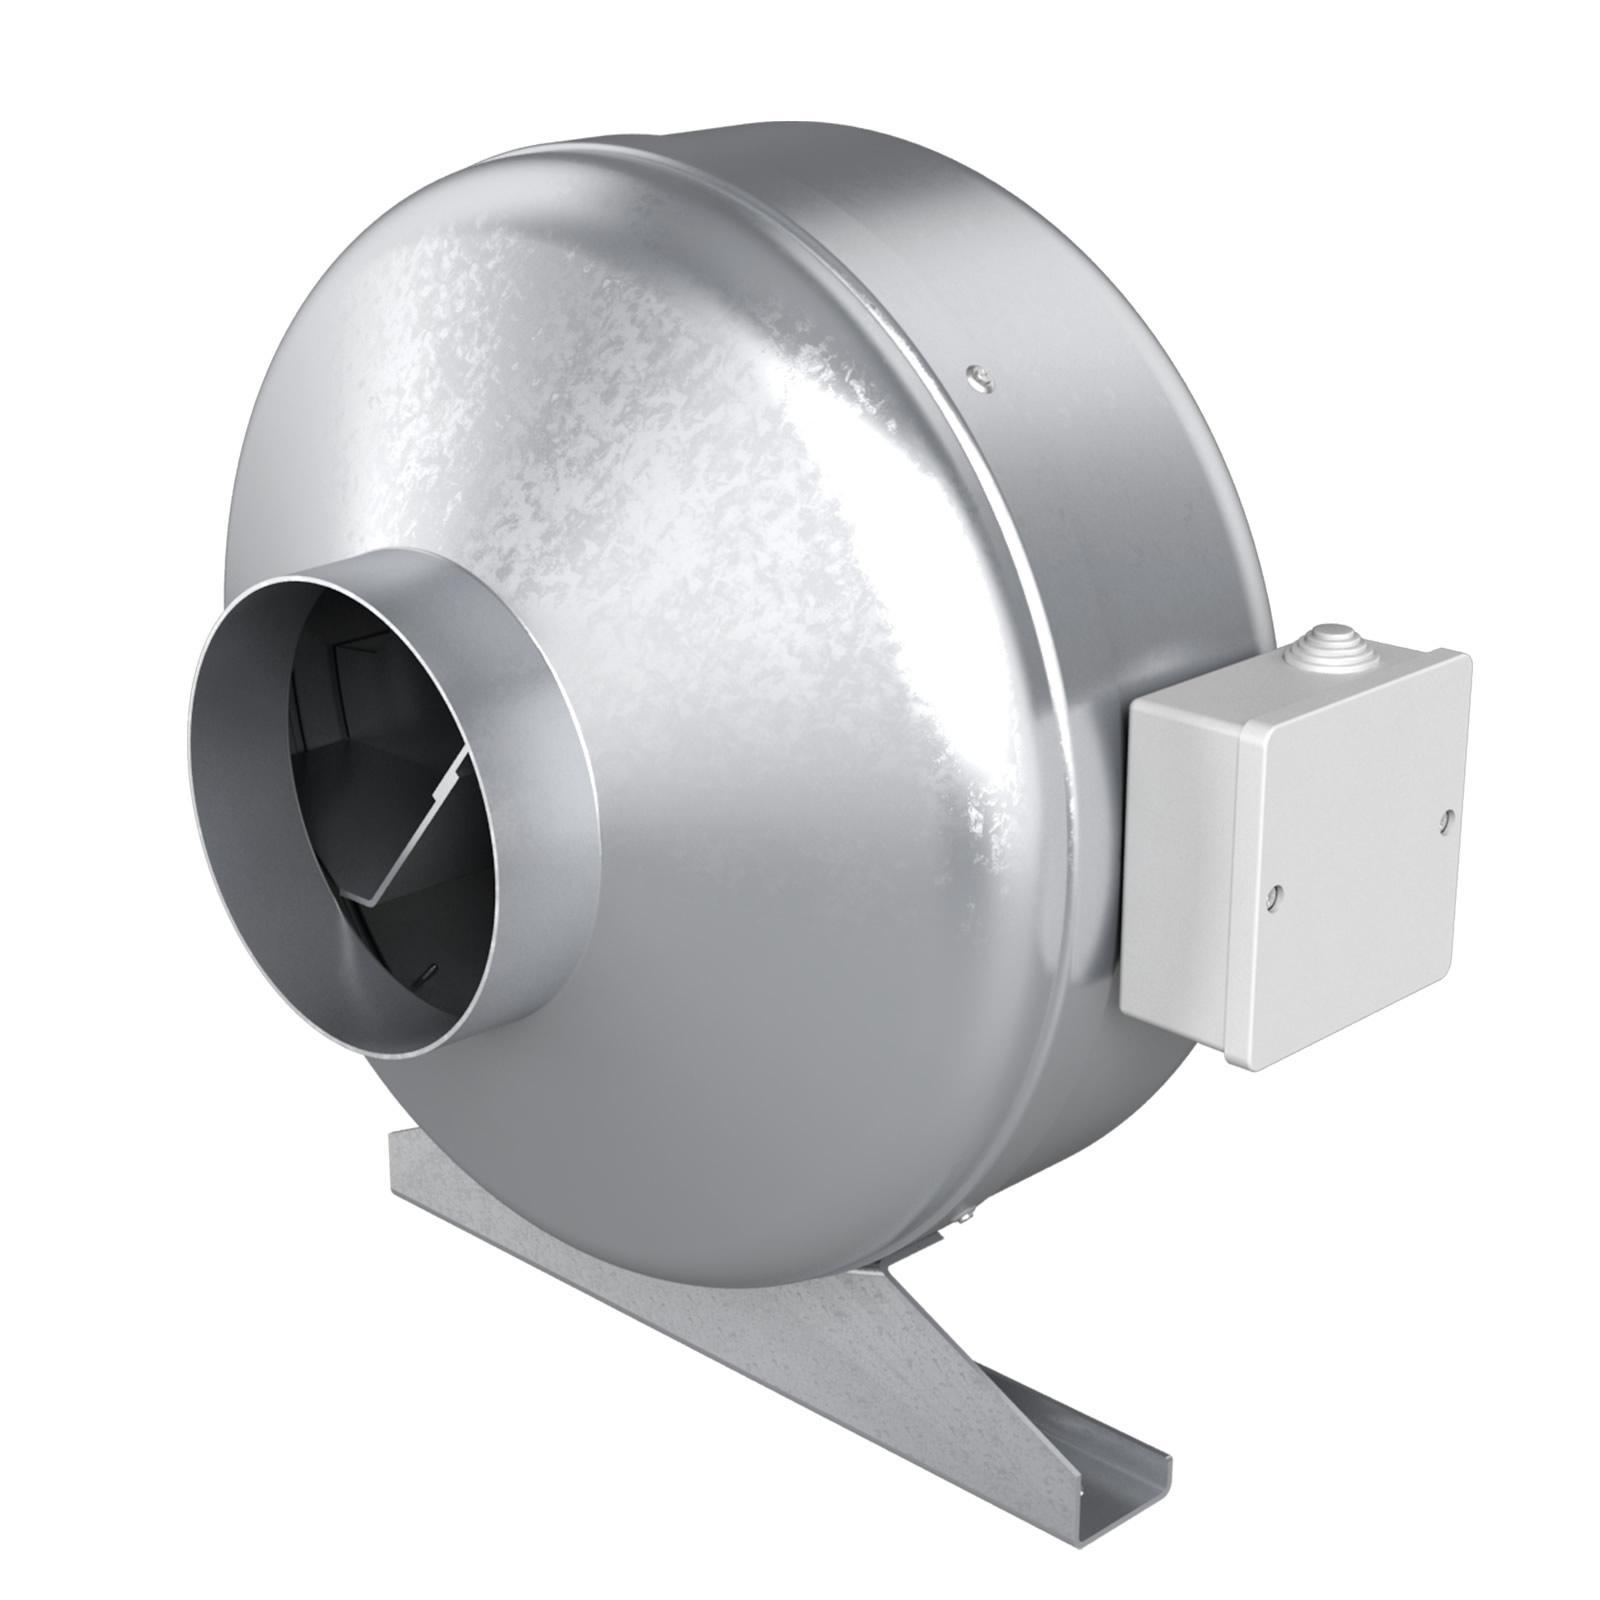 Вентилятор Era Mars gdf 150 era mars gdf 150 вентилятор центробежный канальный